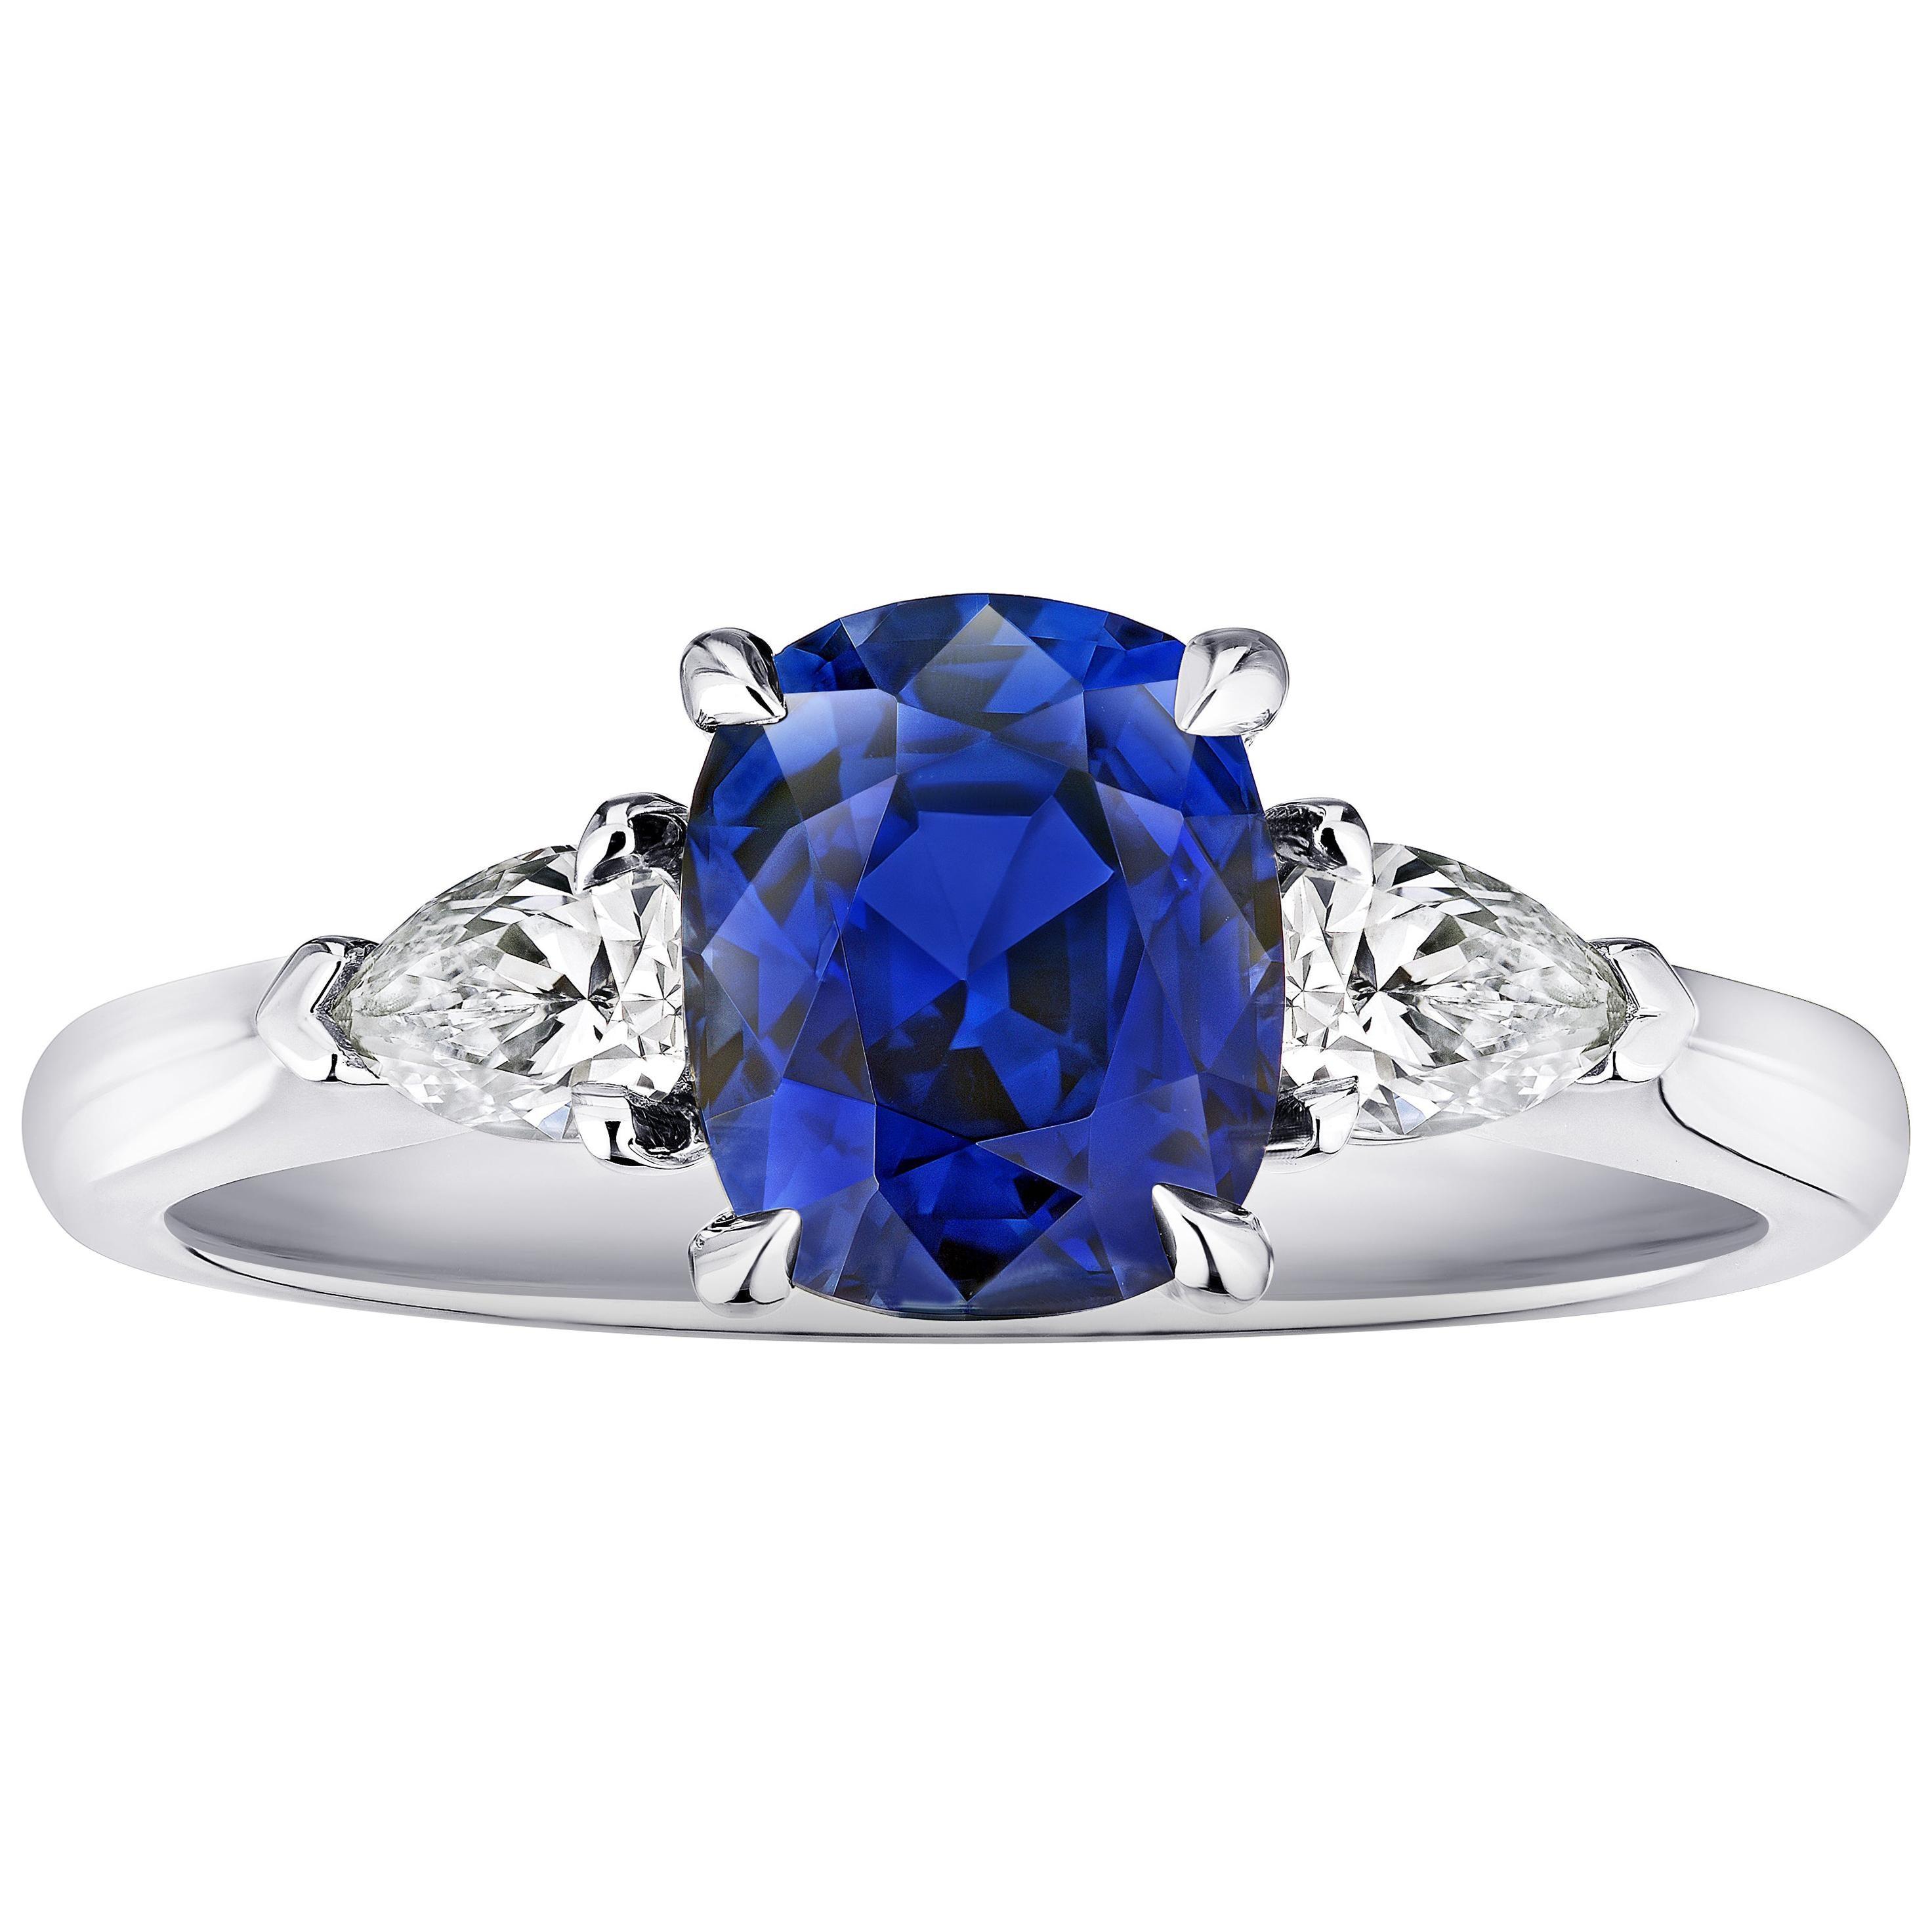 2.11 Carat Cushion Blue Sapphire and Diamond Ring